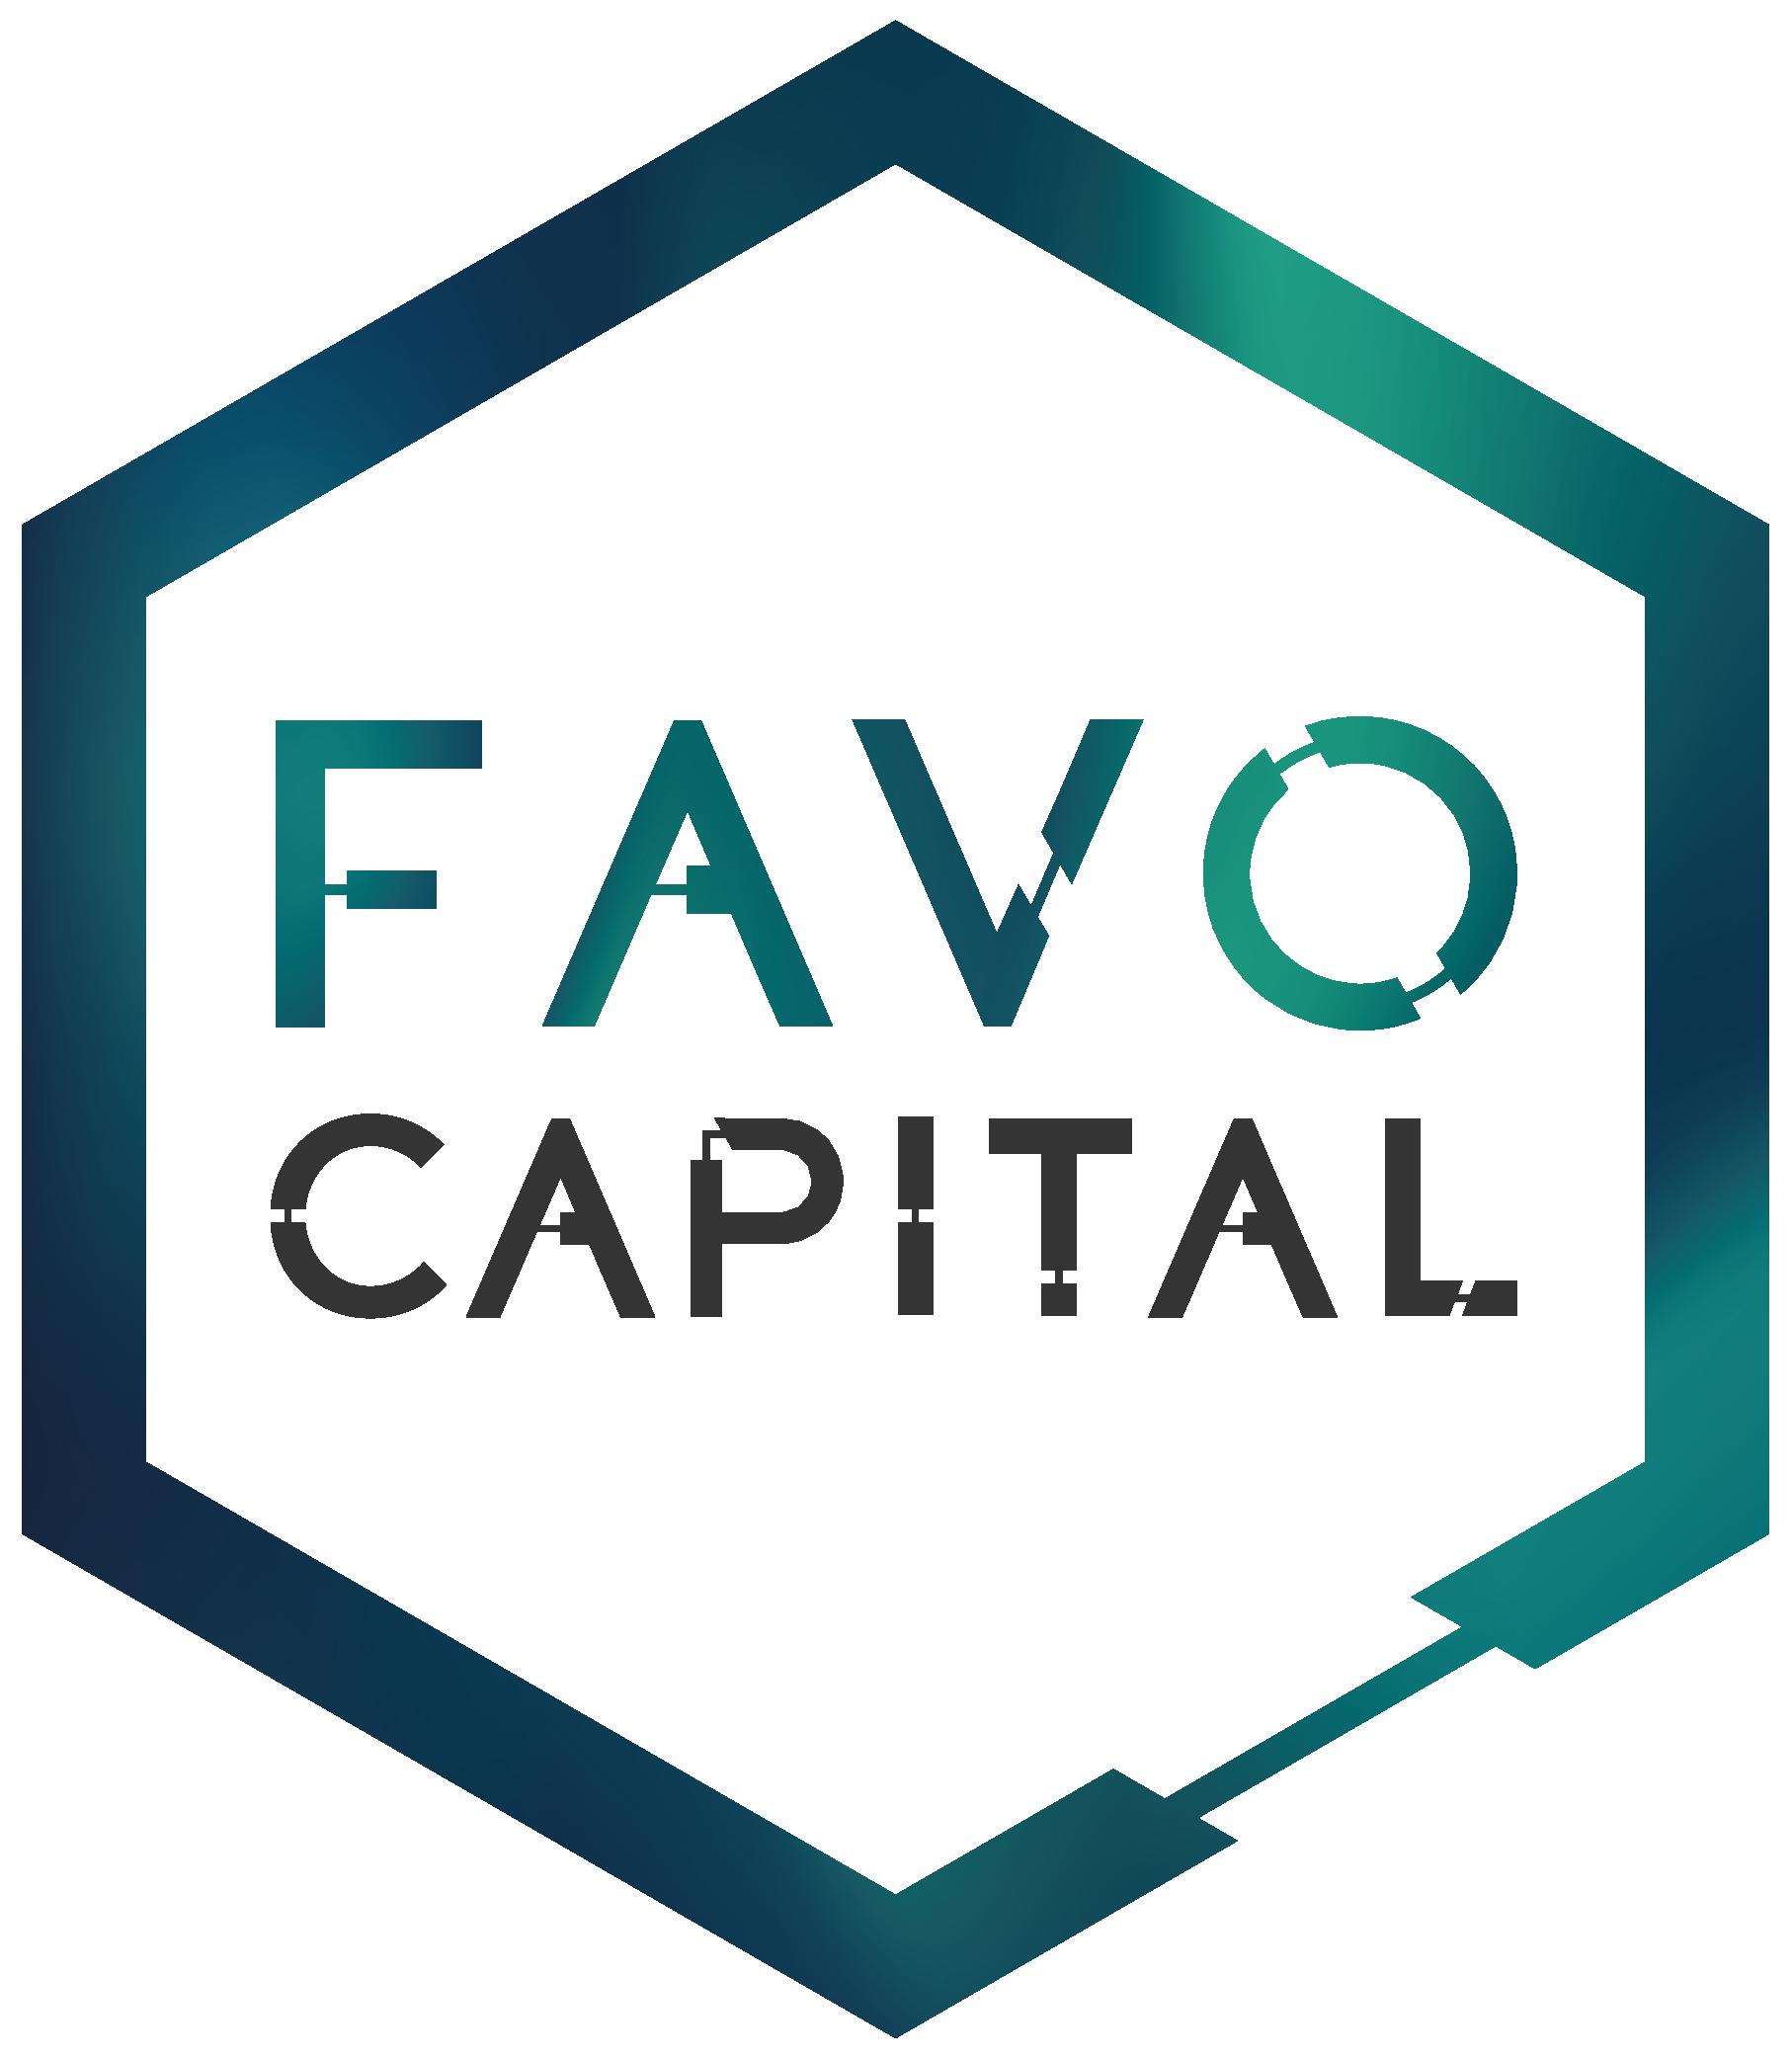 FAVO Capital